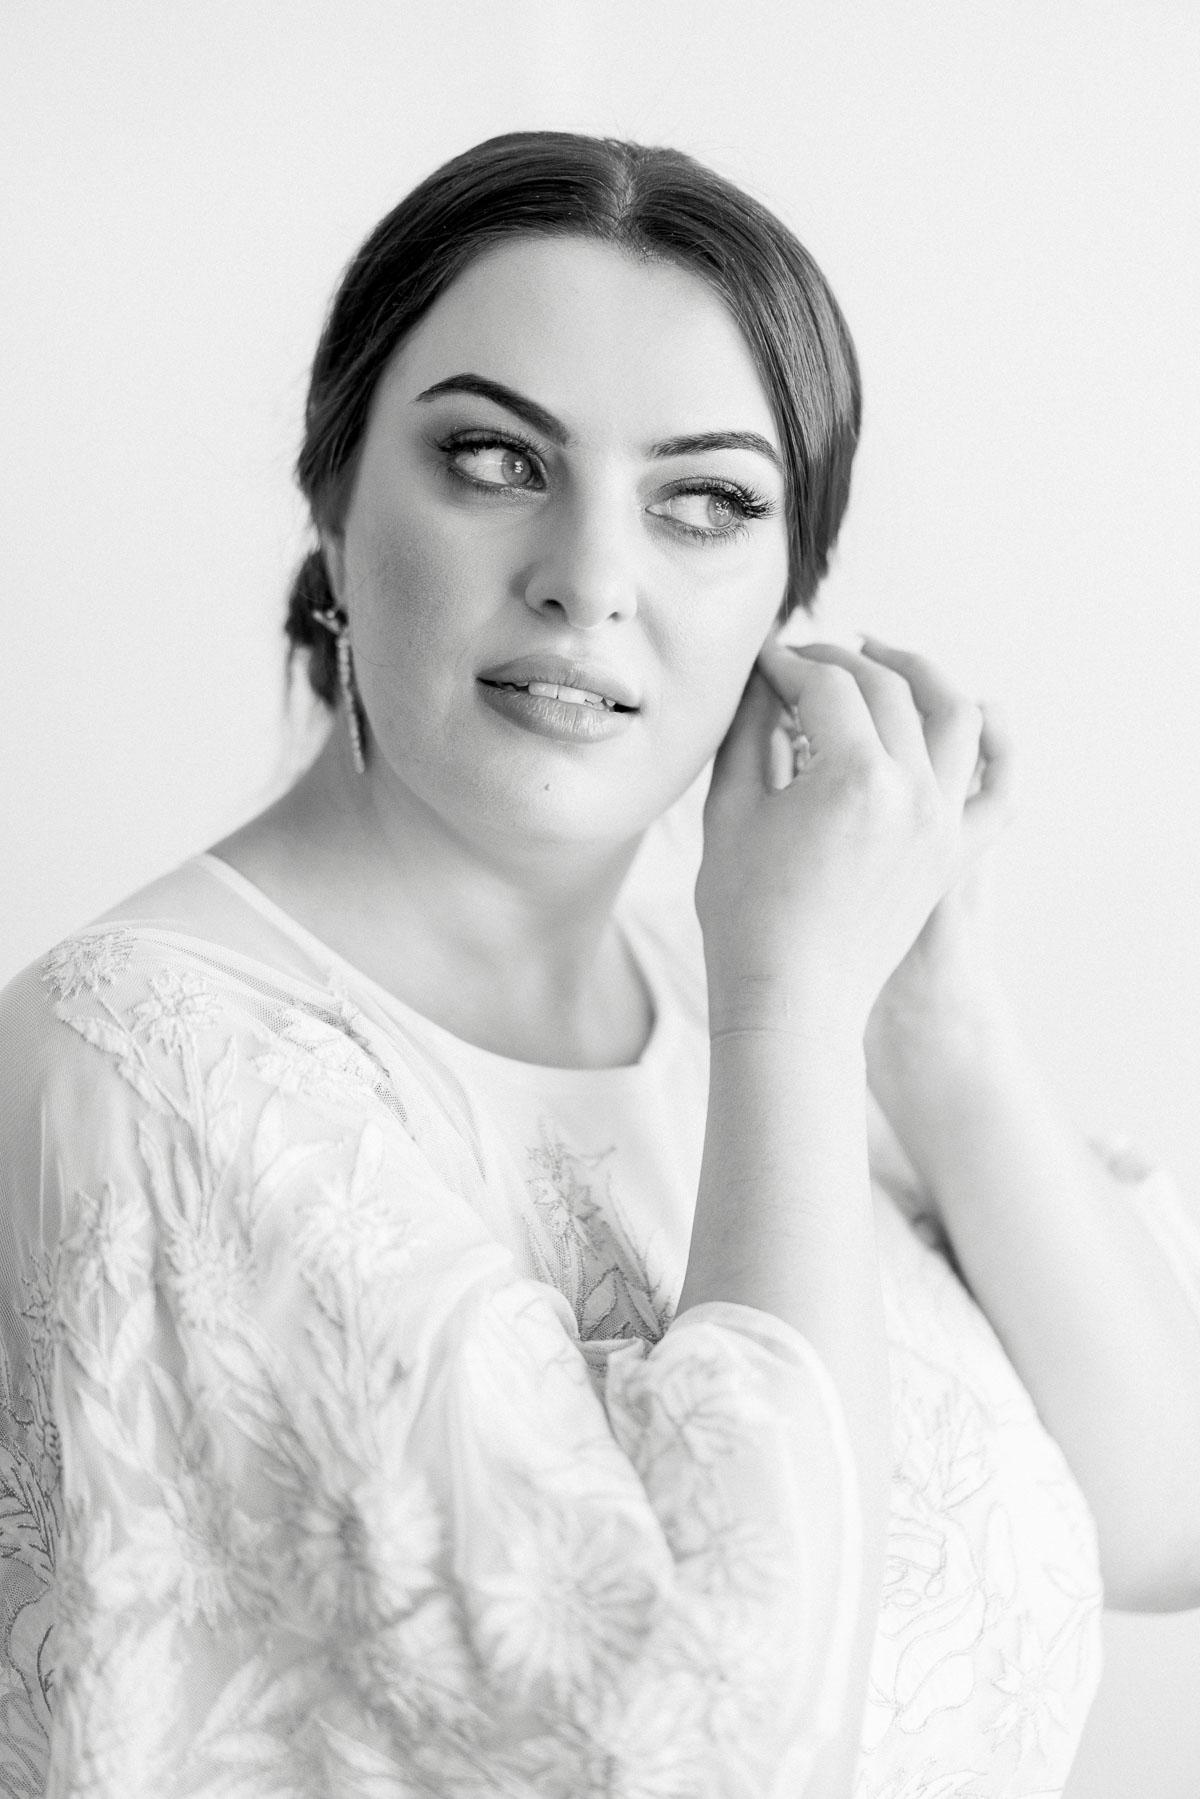 little-henri-cafe-wedding-thornbury-heart+soul-weddings-jane-aaron-05090.jpg